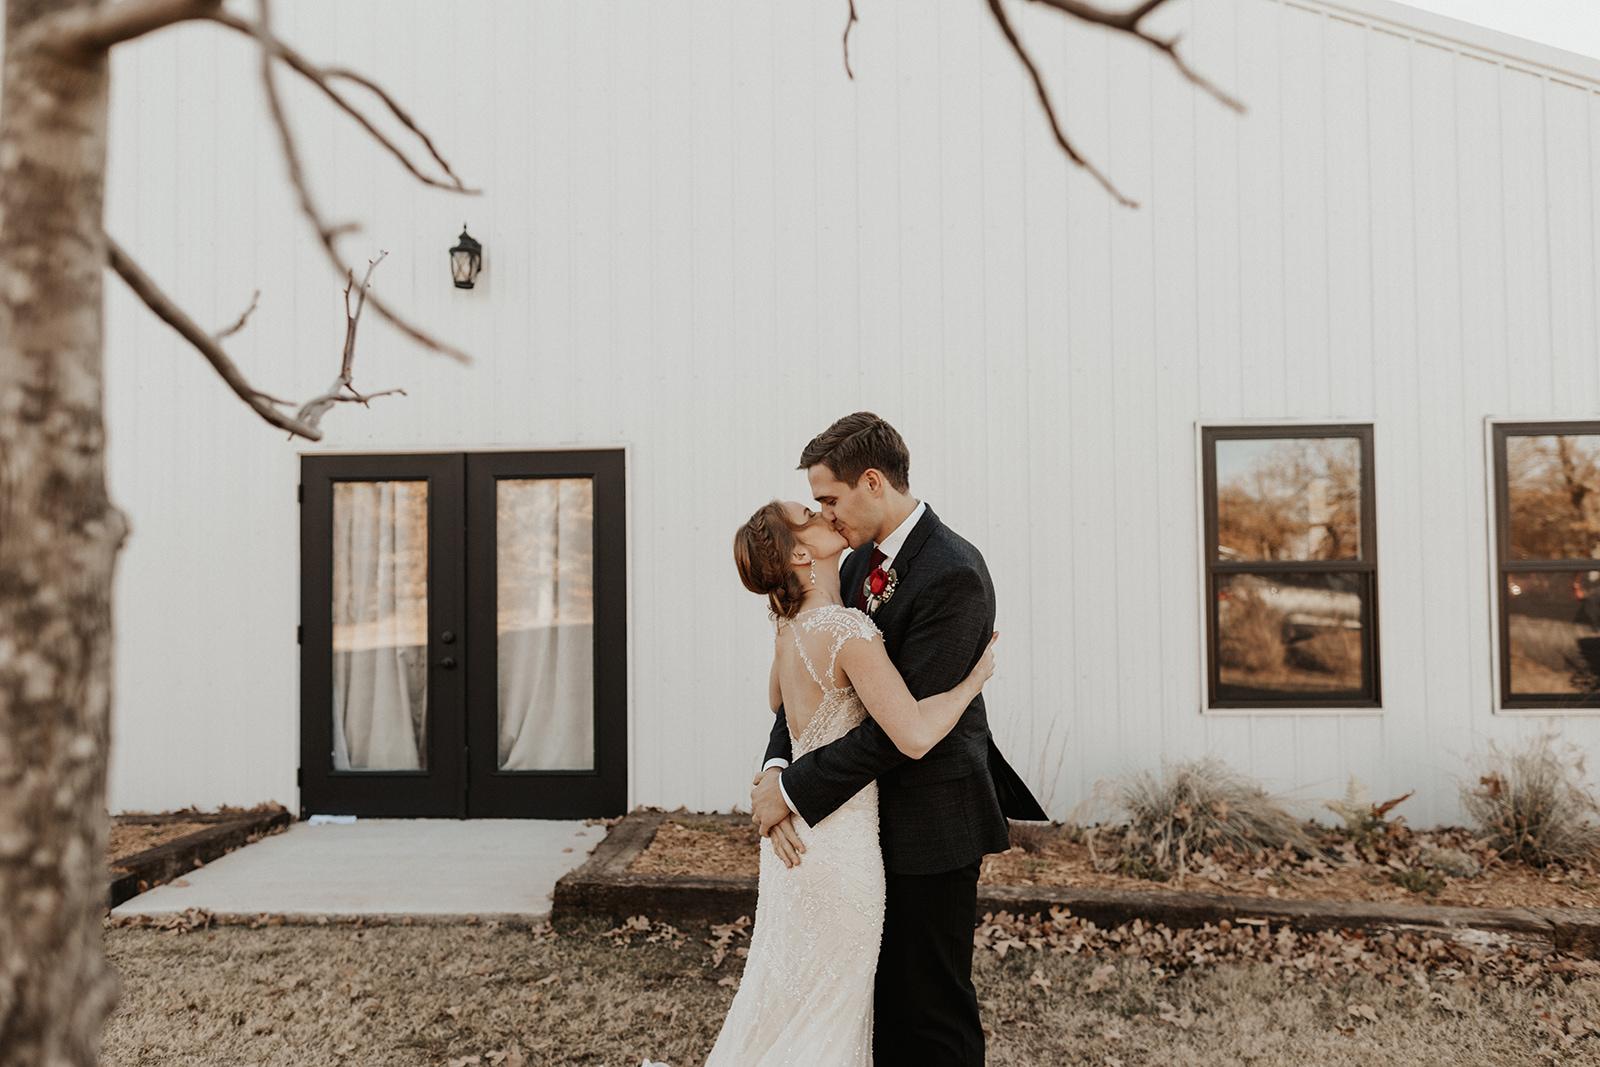 Best Wedding Venue in Tulsa Bixby Dream Point Ranch 15.jpg